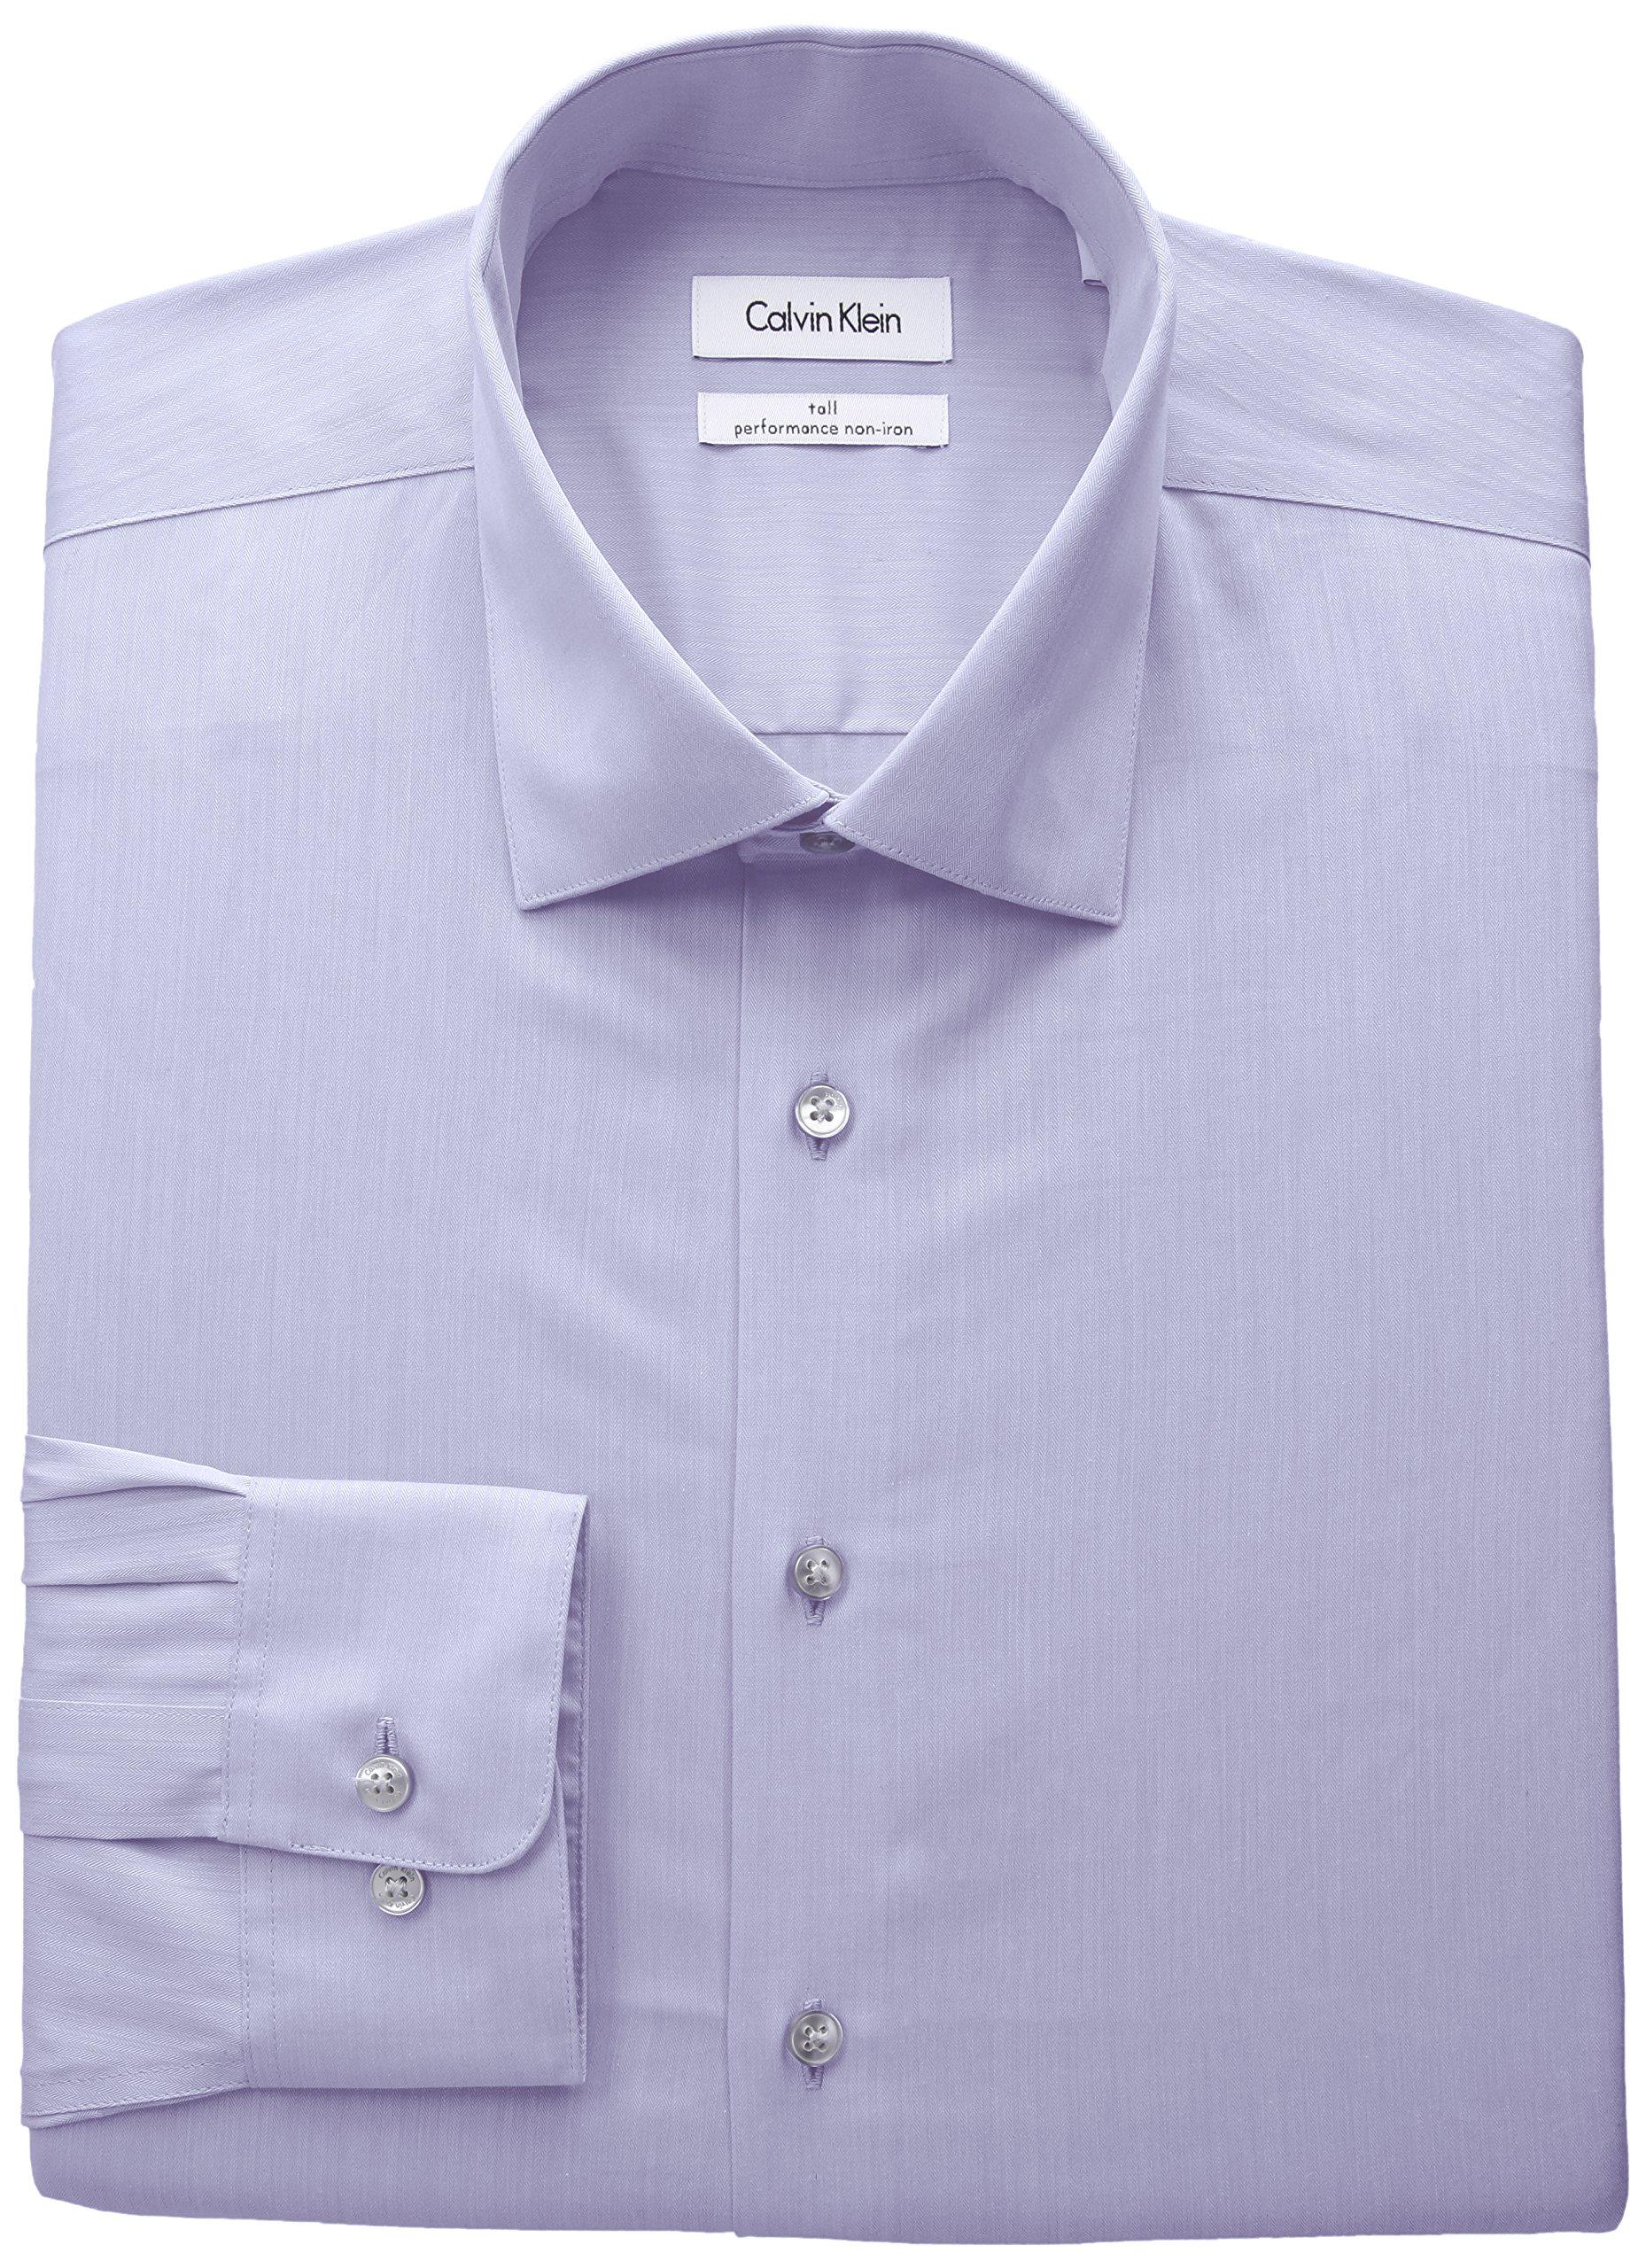 Calvin Klein Men's Big and Tall Non Iron Fit Herringbone Spread Collar Dress Shirt, Lilac, 18.5'' Neck 37''-38'' Sleeve